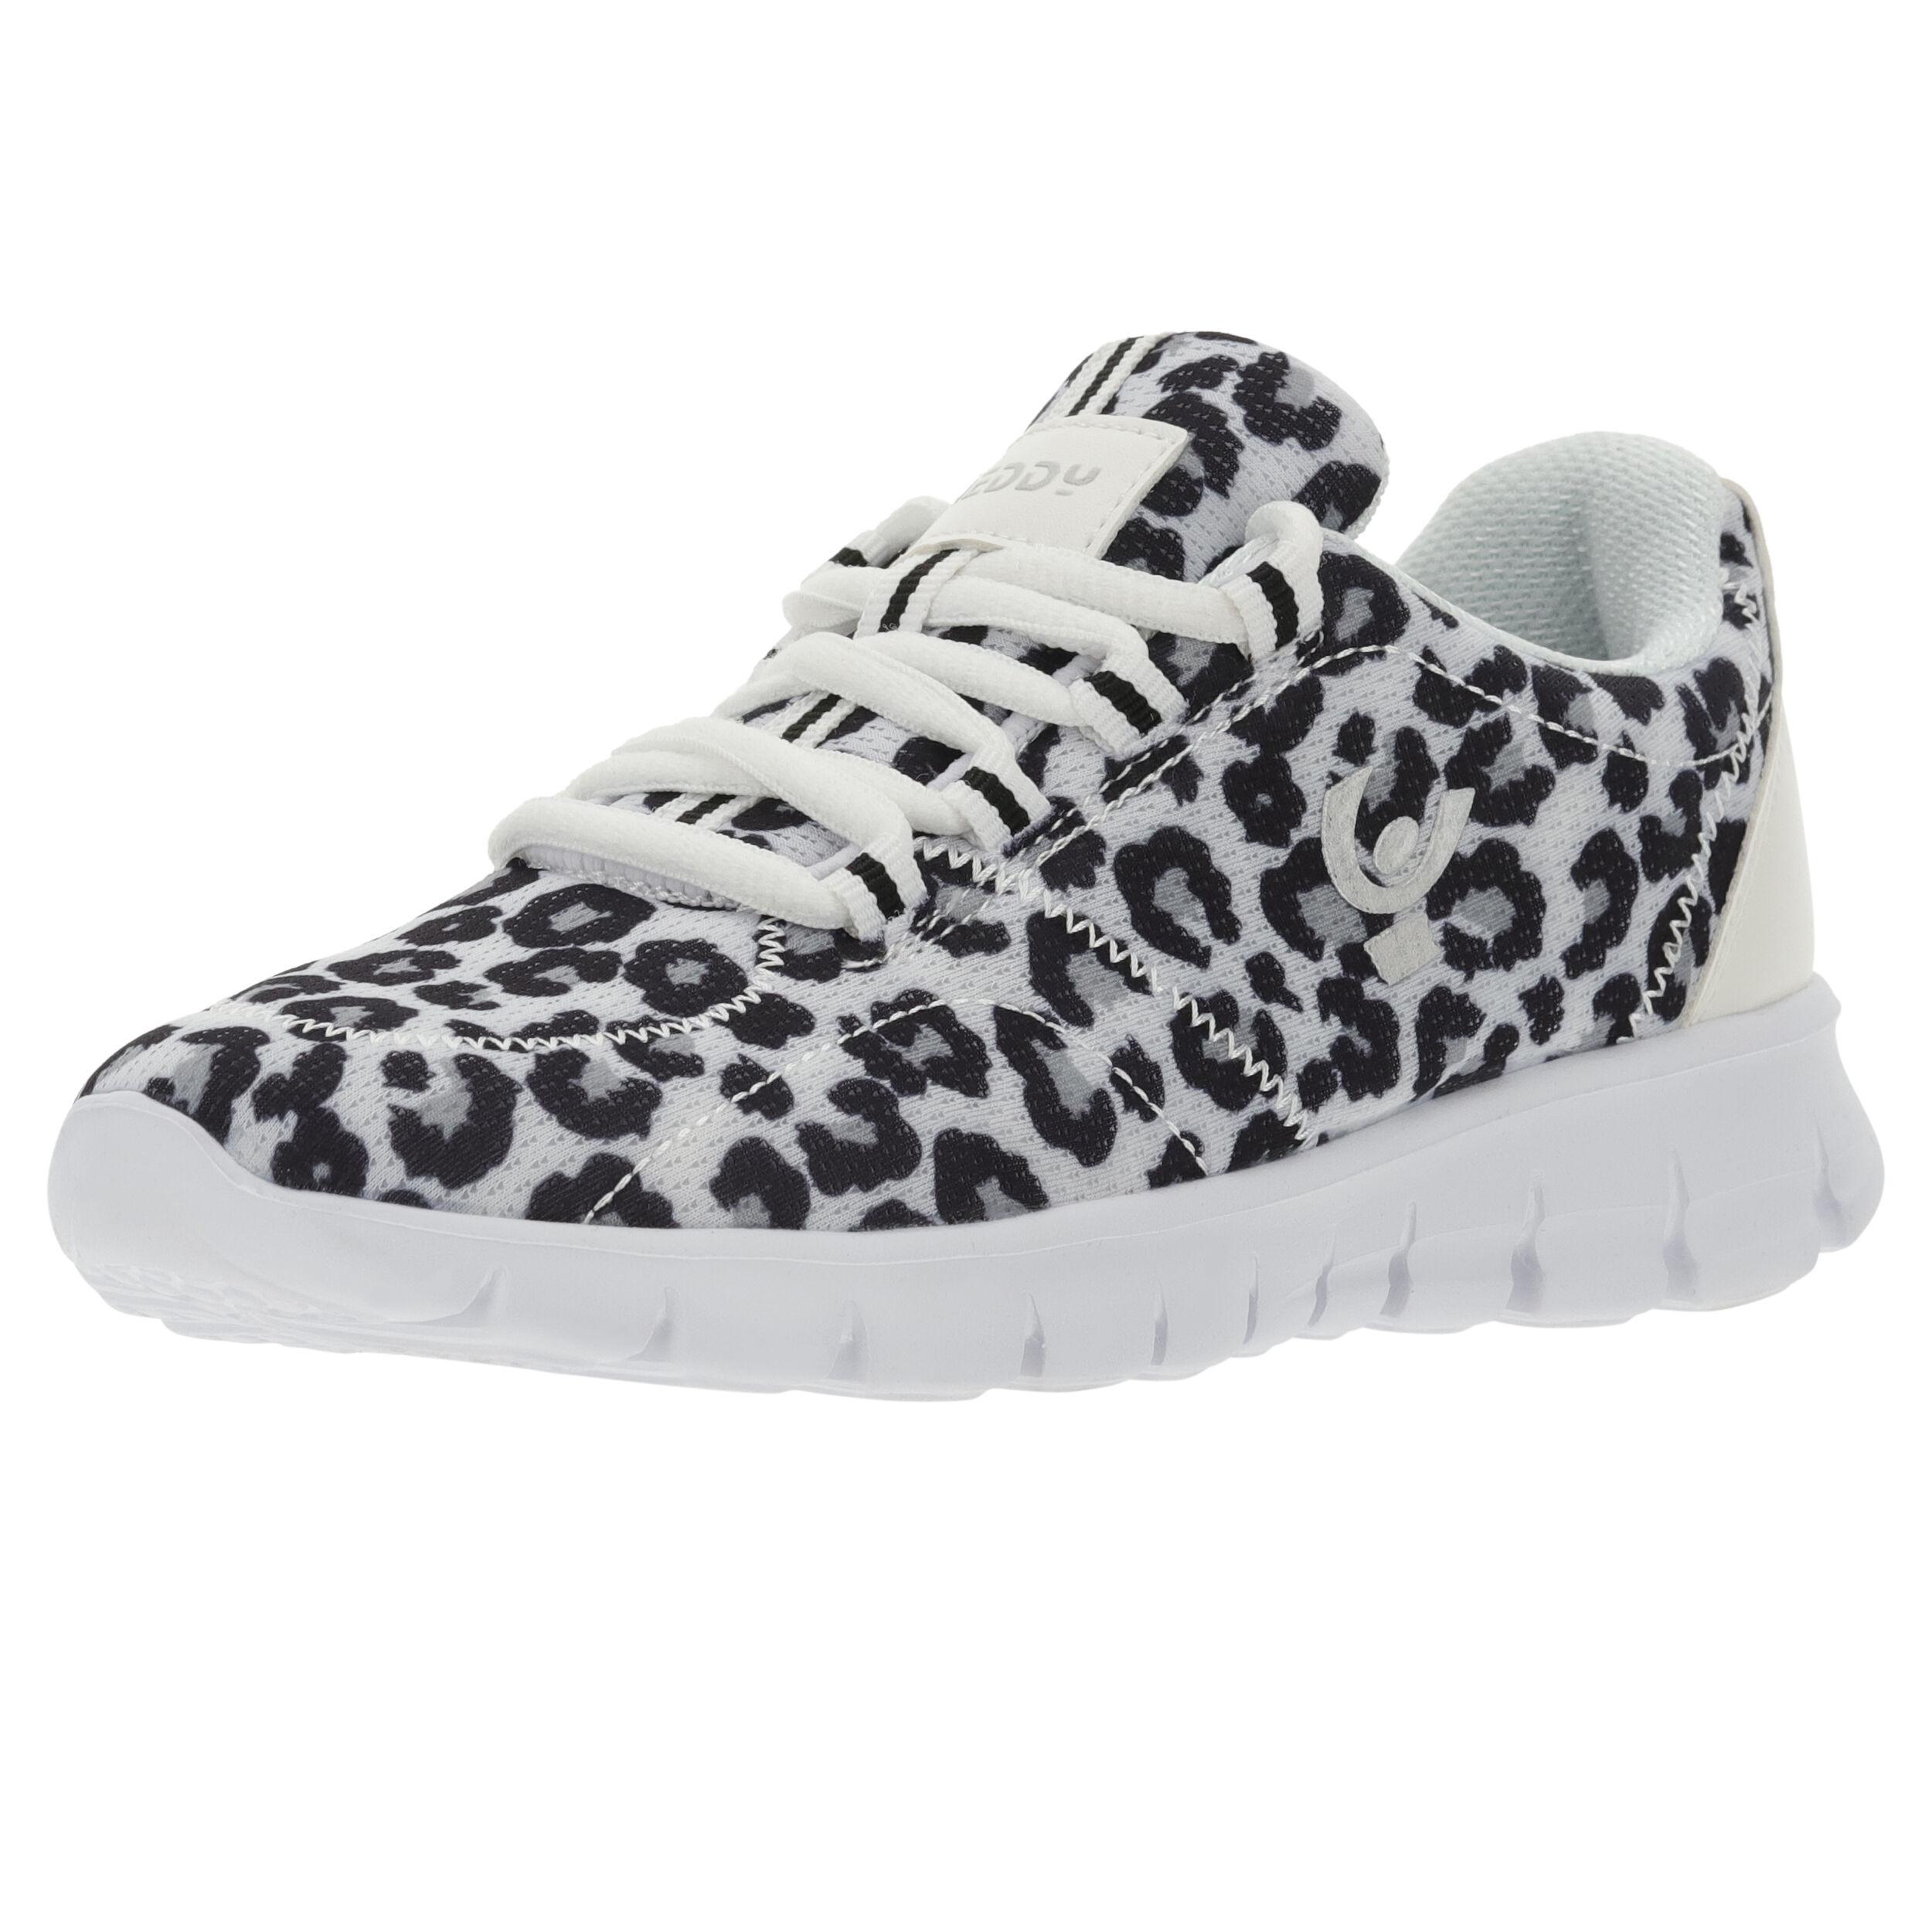 Freddy Sneakers ultraleggere mesh traspirante leopardato Leopard Animalier White